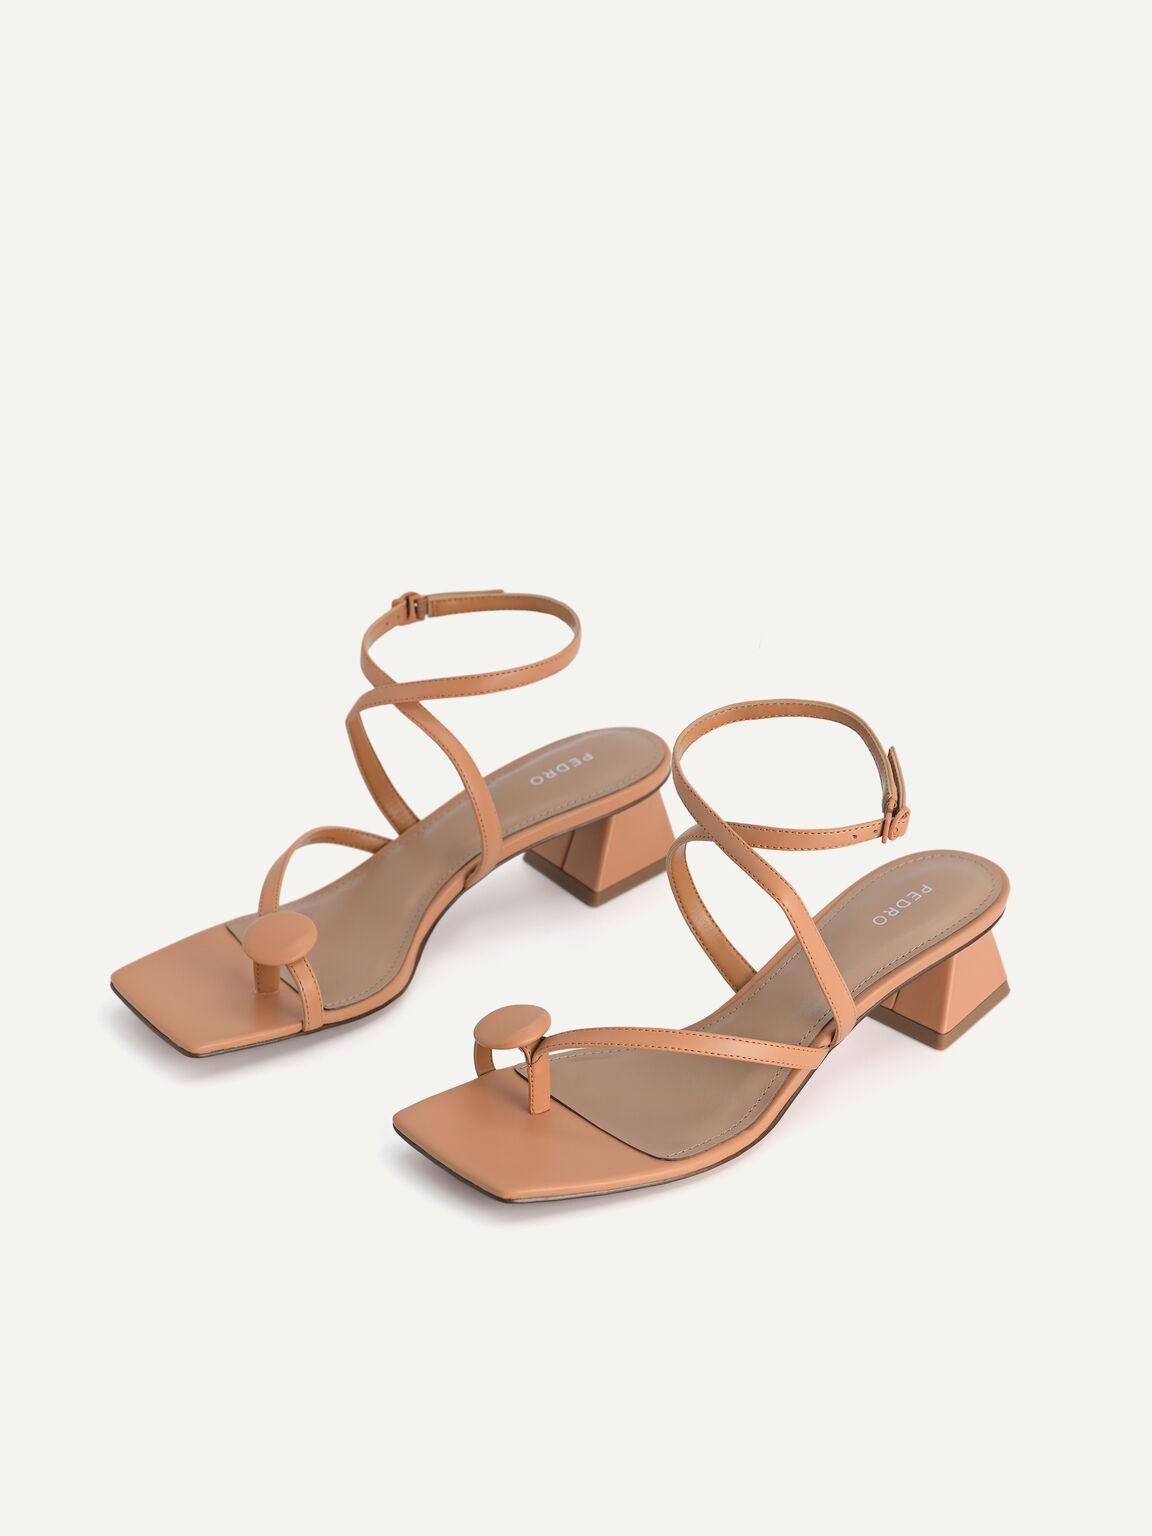 Strappy Toe-Loop Heeled Sandals, Camel, hi-res